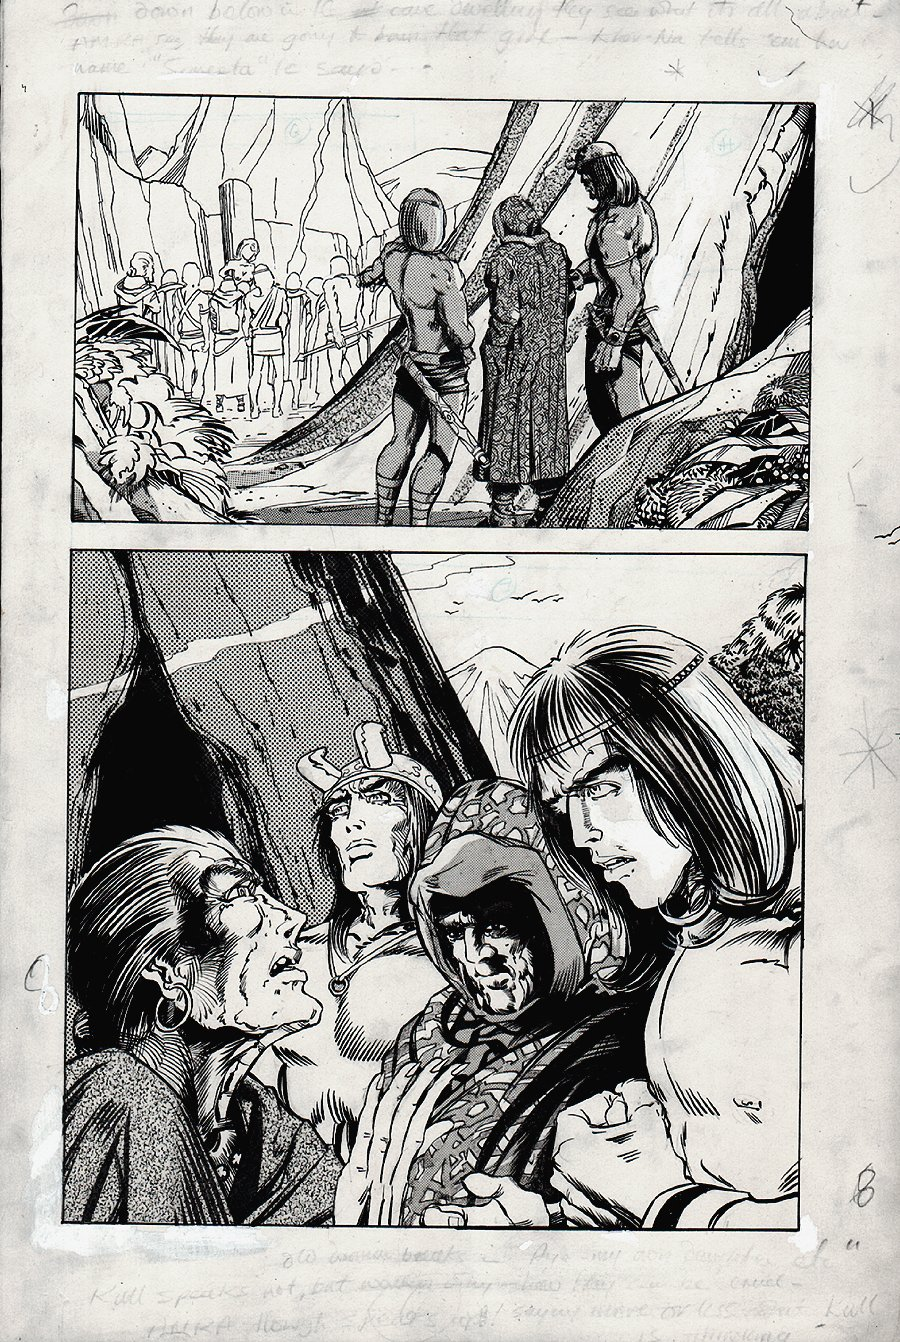 Kull Of Atlantis p 8 (Precursor To Conan The Barbarian #1) 1969-1970